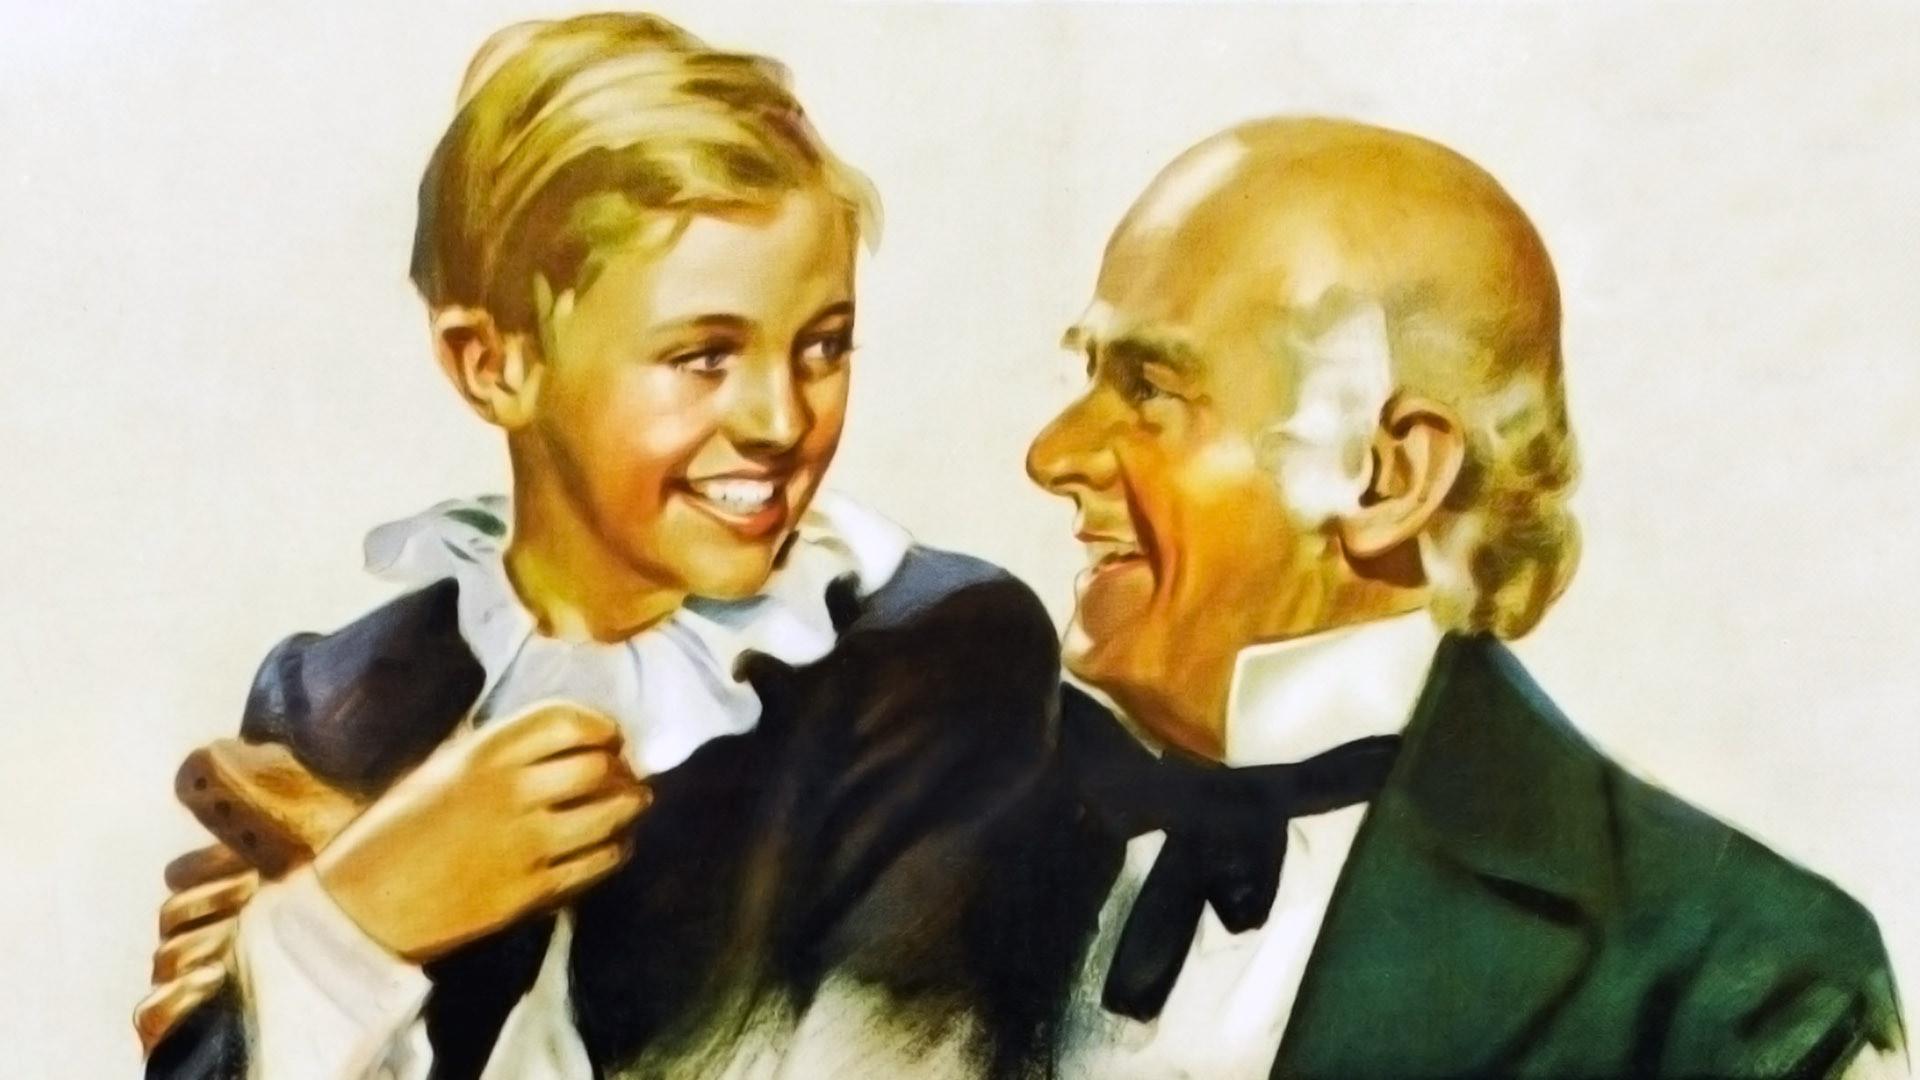 a christmas carol 1938 image - A Christmas Carol Movie 1938